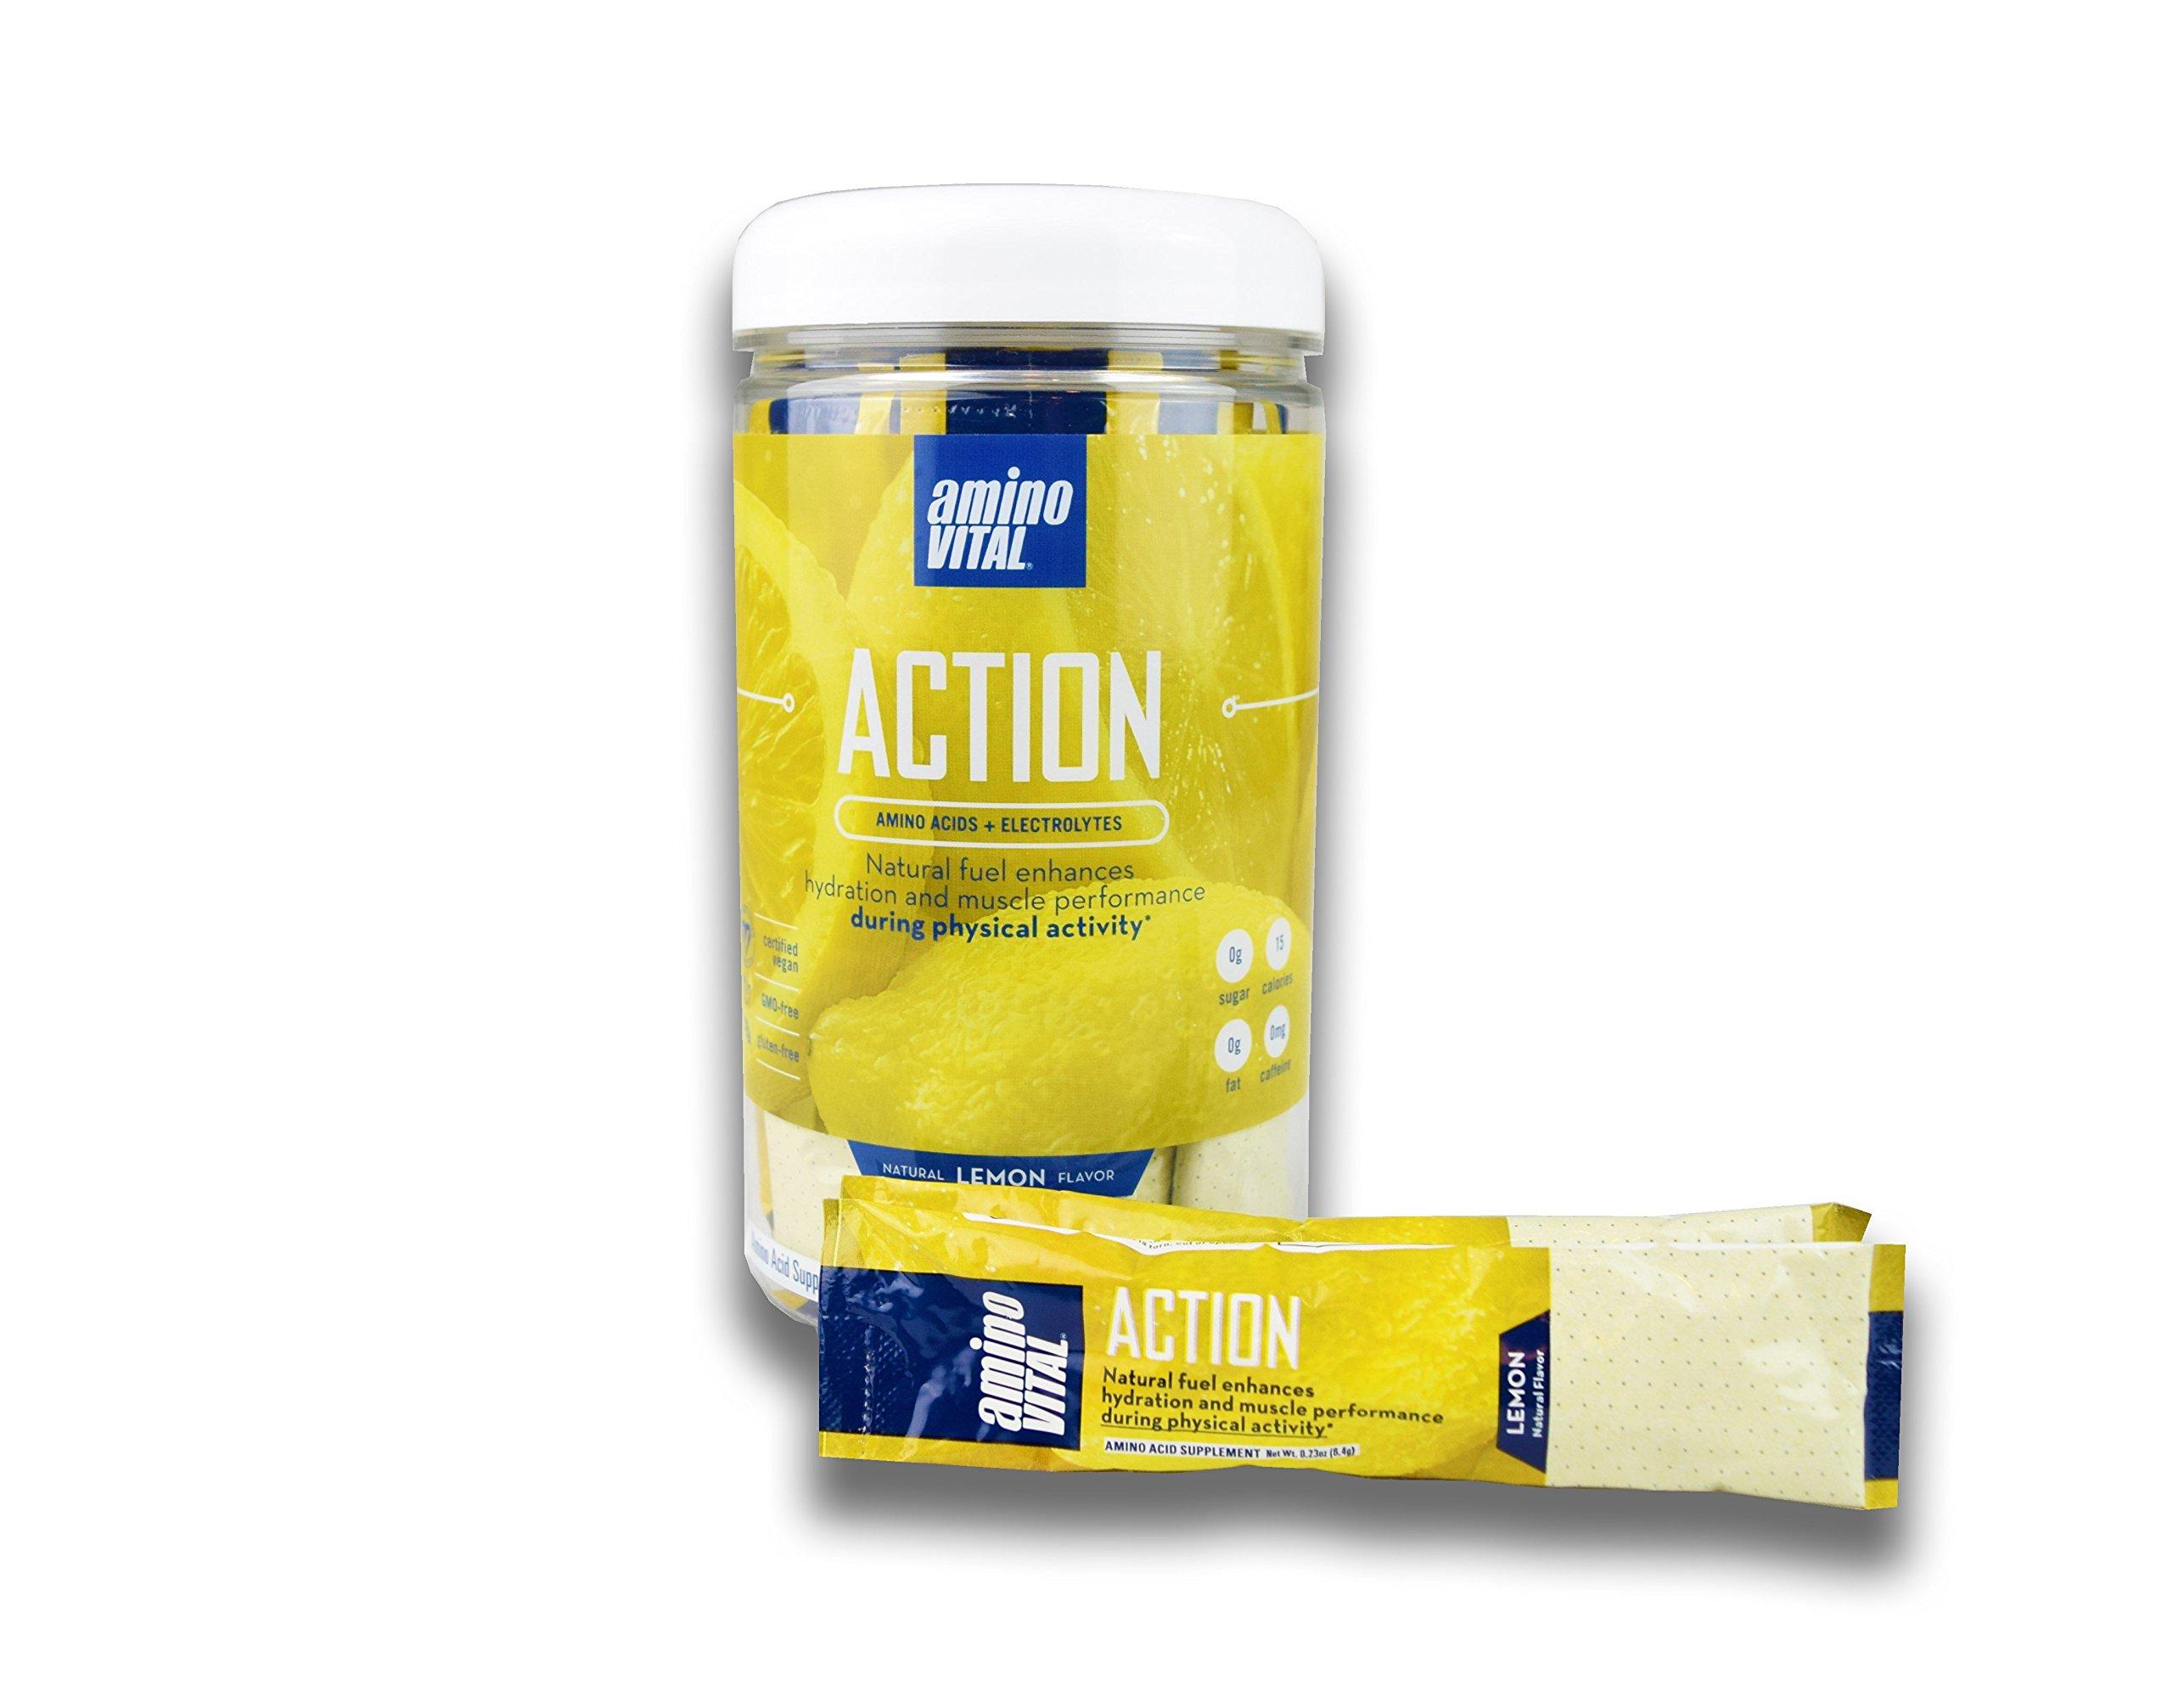 Amino VITAL Action - Fermented Vegan BCAAs Amino Acid Powder + Electrolytes in Single Serve Packets | Keto Friendly Supplement with Glutamine & Arginine | No Additives & No Fillers | 14 x 6.4g, Lemon